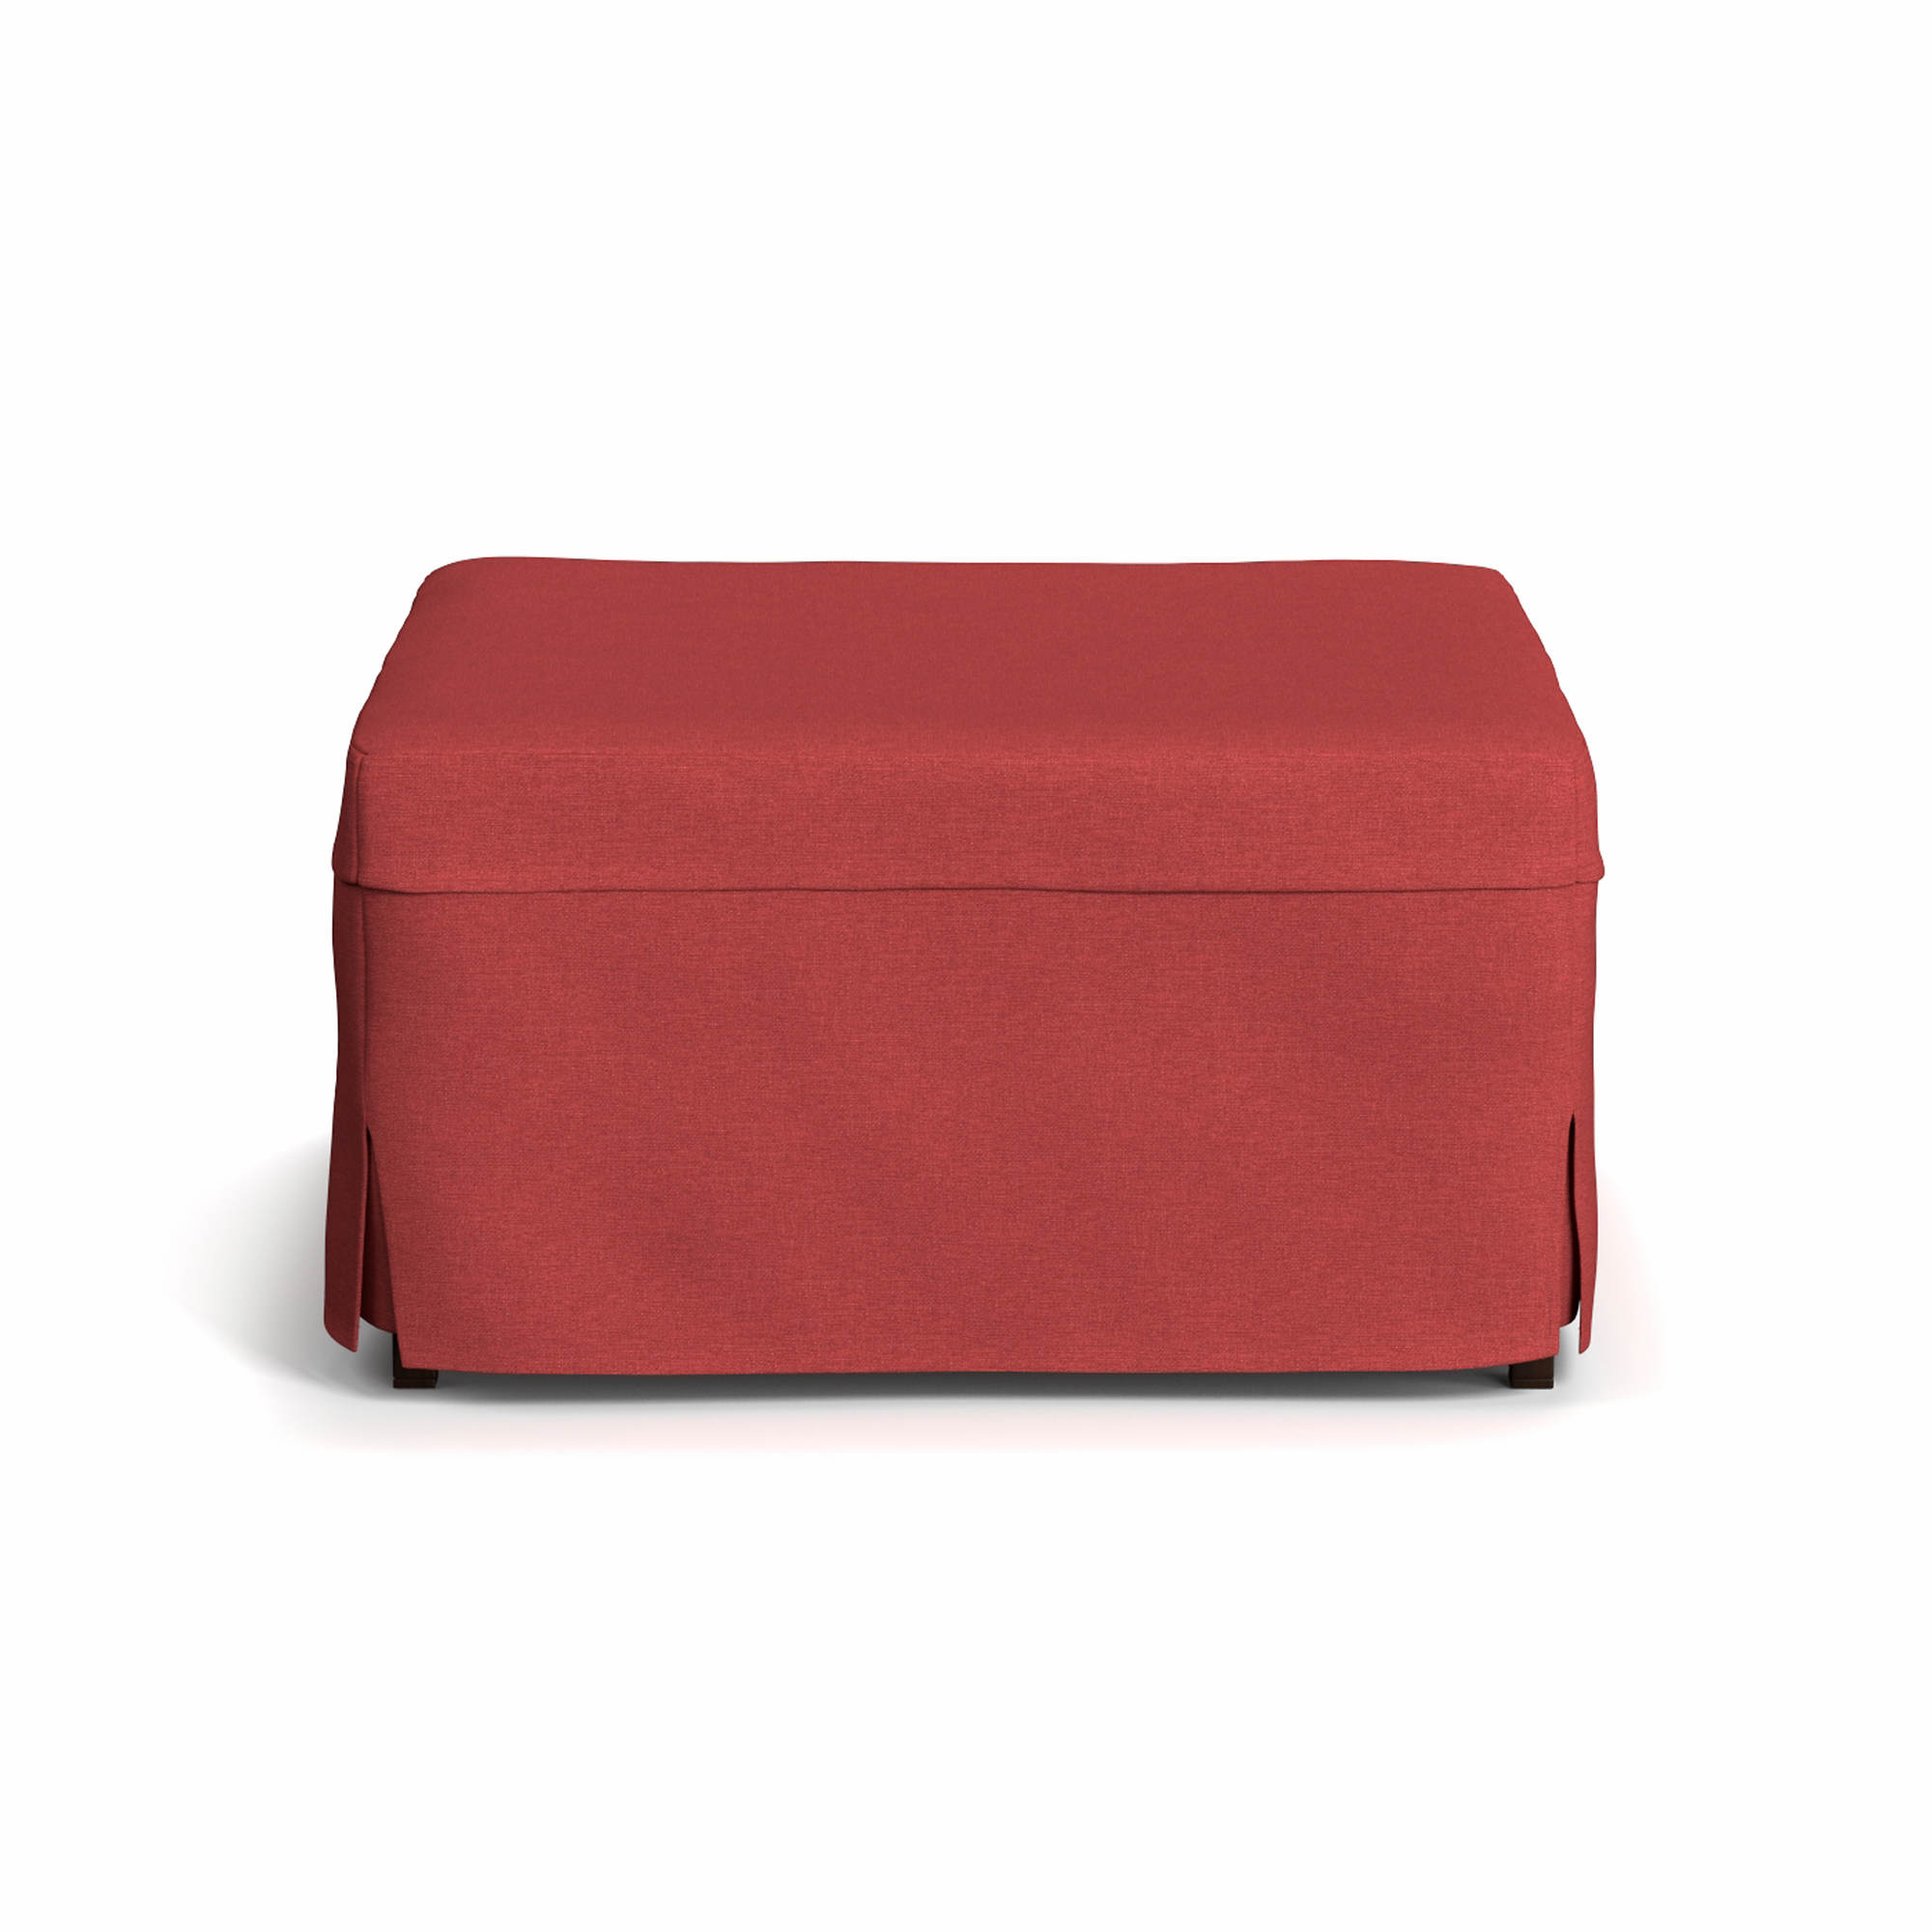 Handy Living Folding Metal Ottoman Bed Crimson Bj S